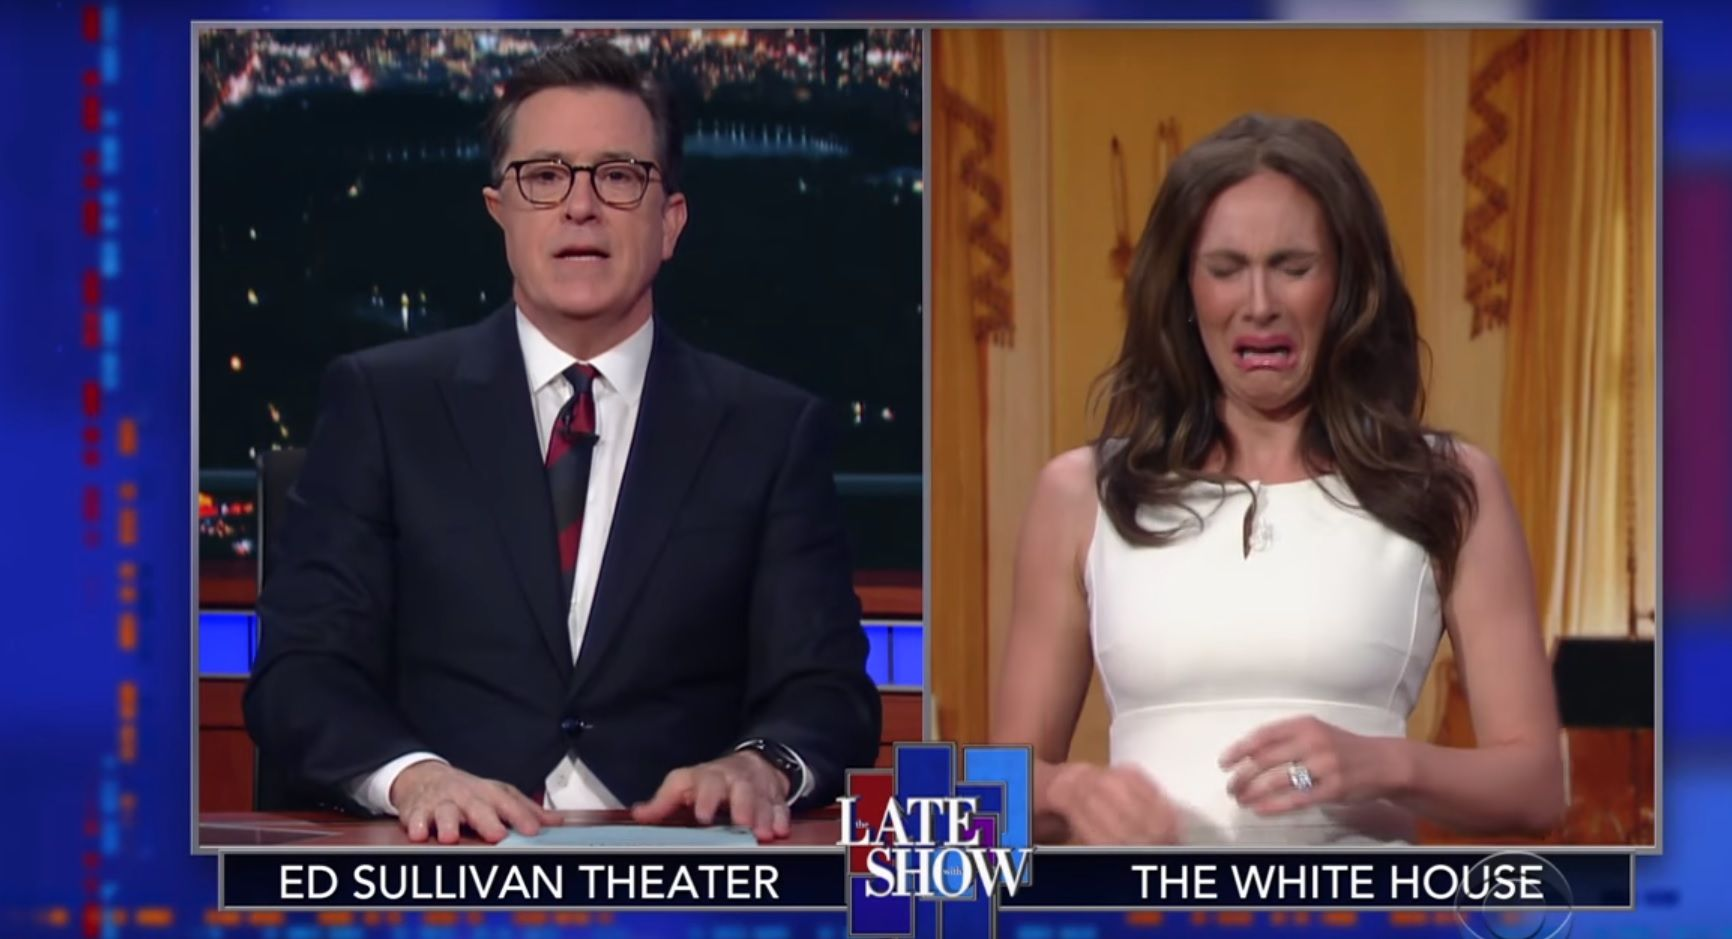 Melania Trump parody on The Late Show